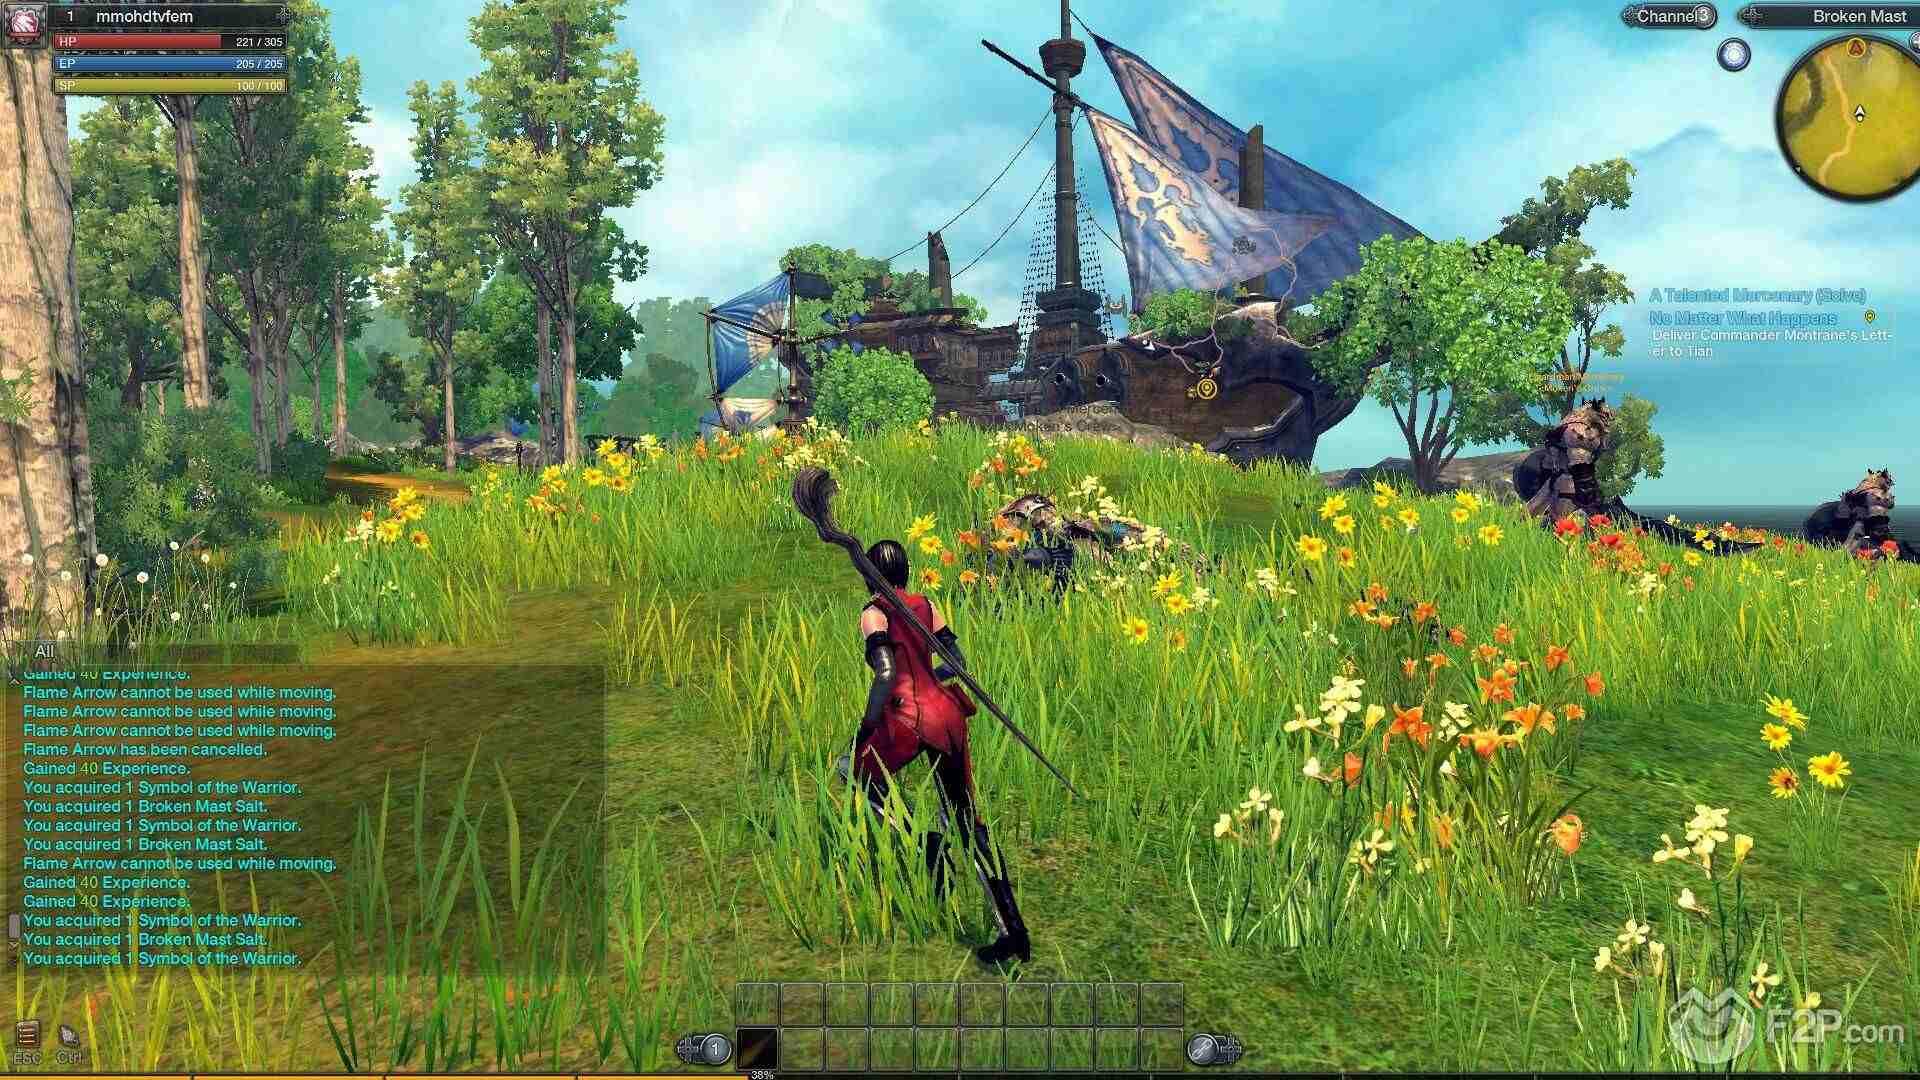 RaiderZ Gameplay Review - Monster Hunting MMO - YouTube